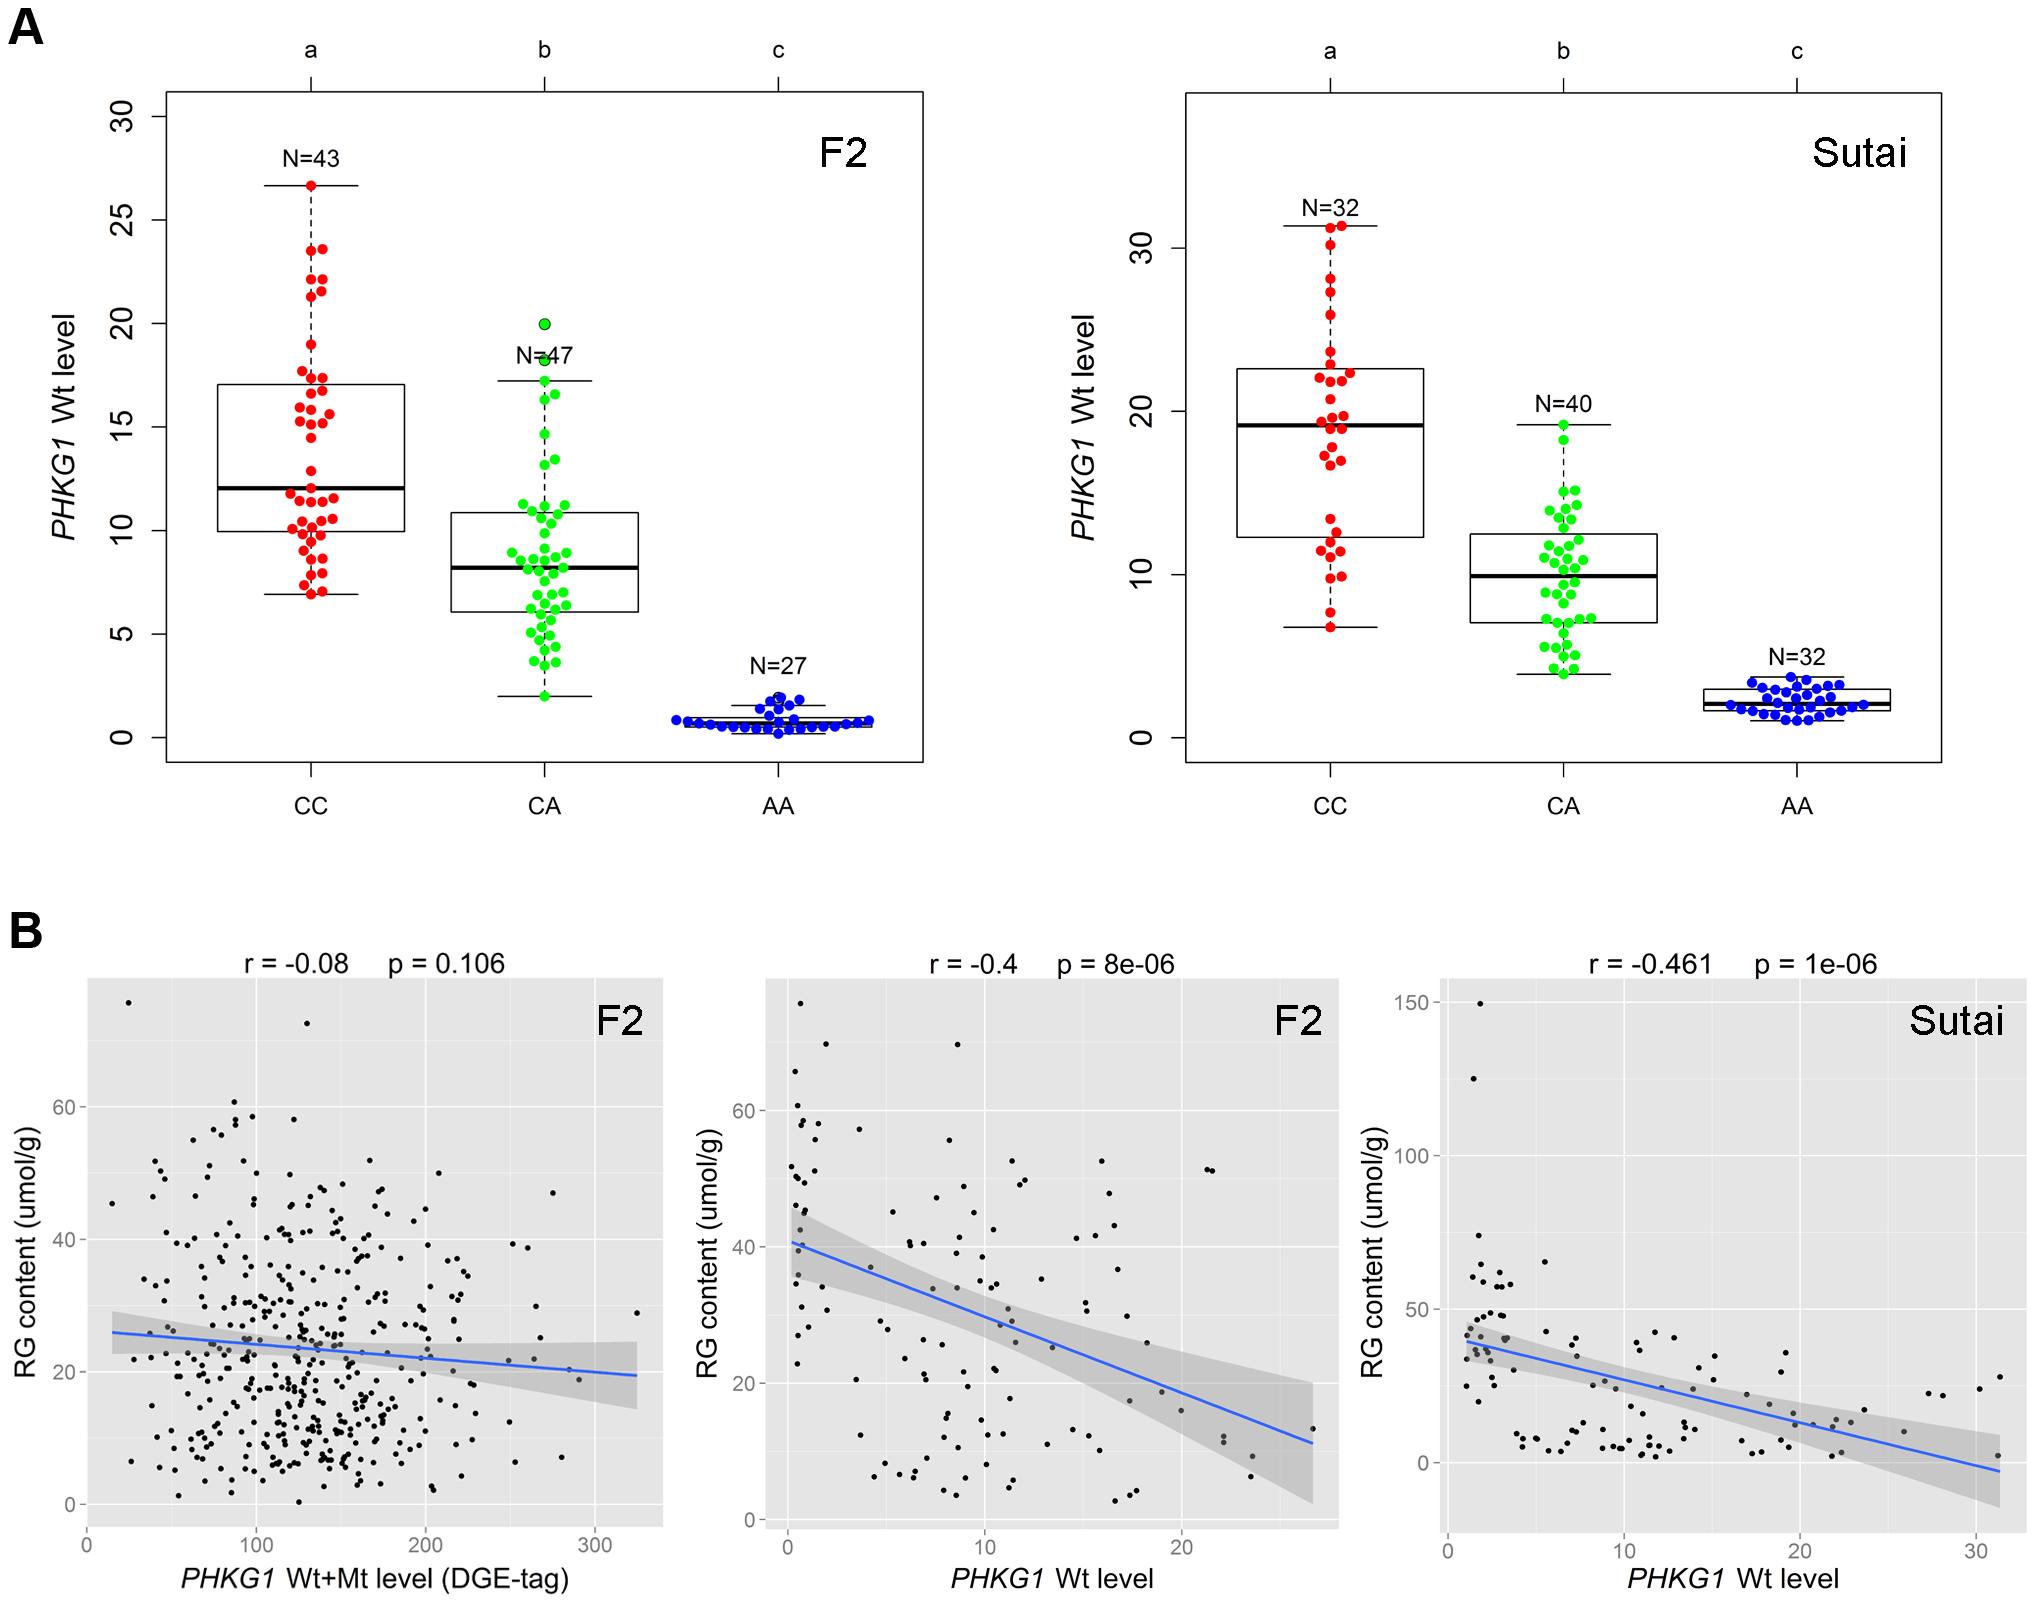 Relationship between the <i>PHKG1</i> transcript level and residual glycogen content.